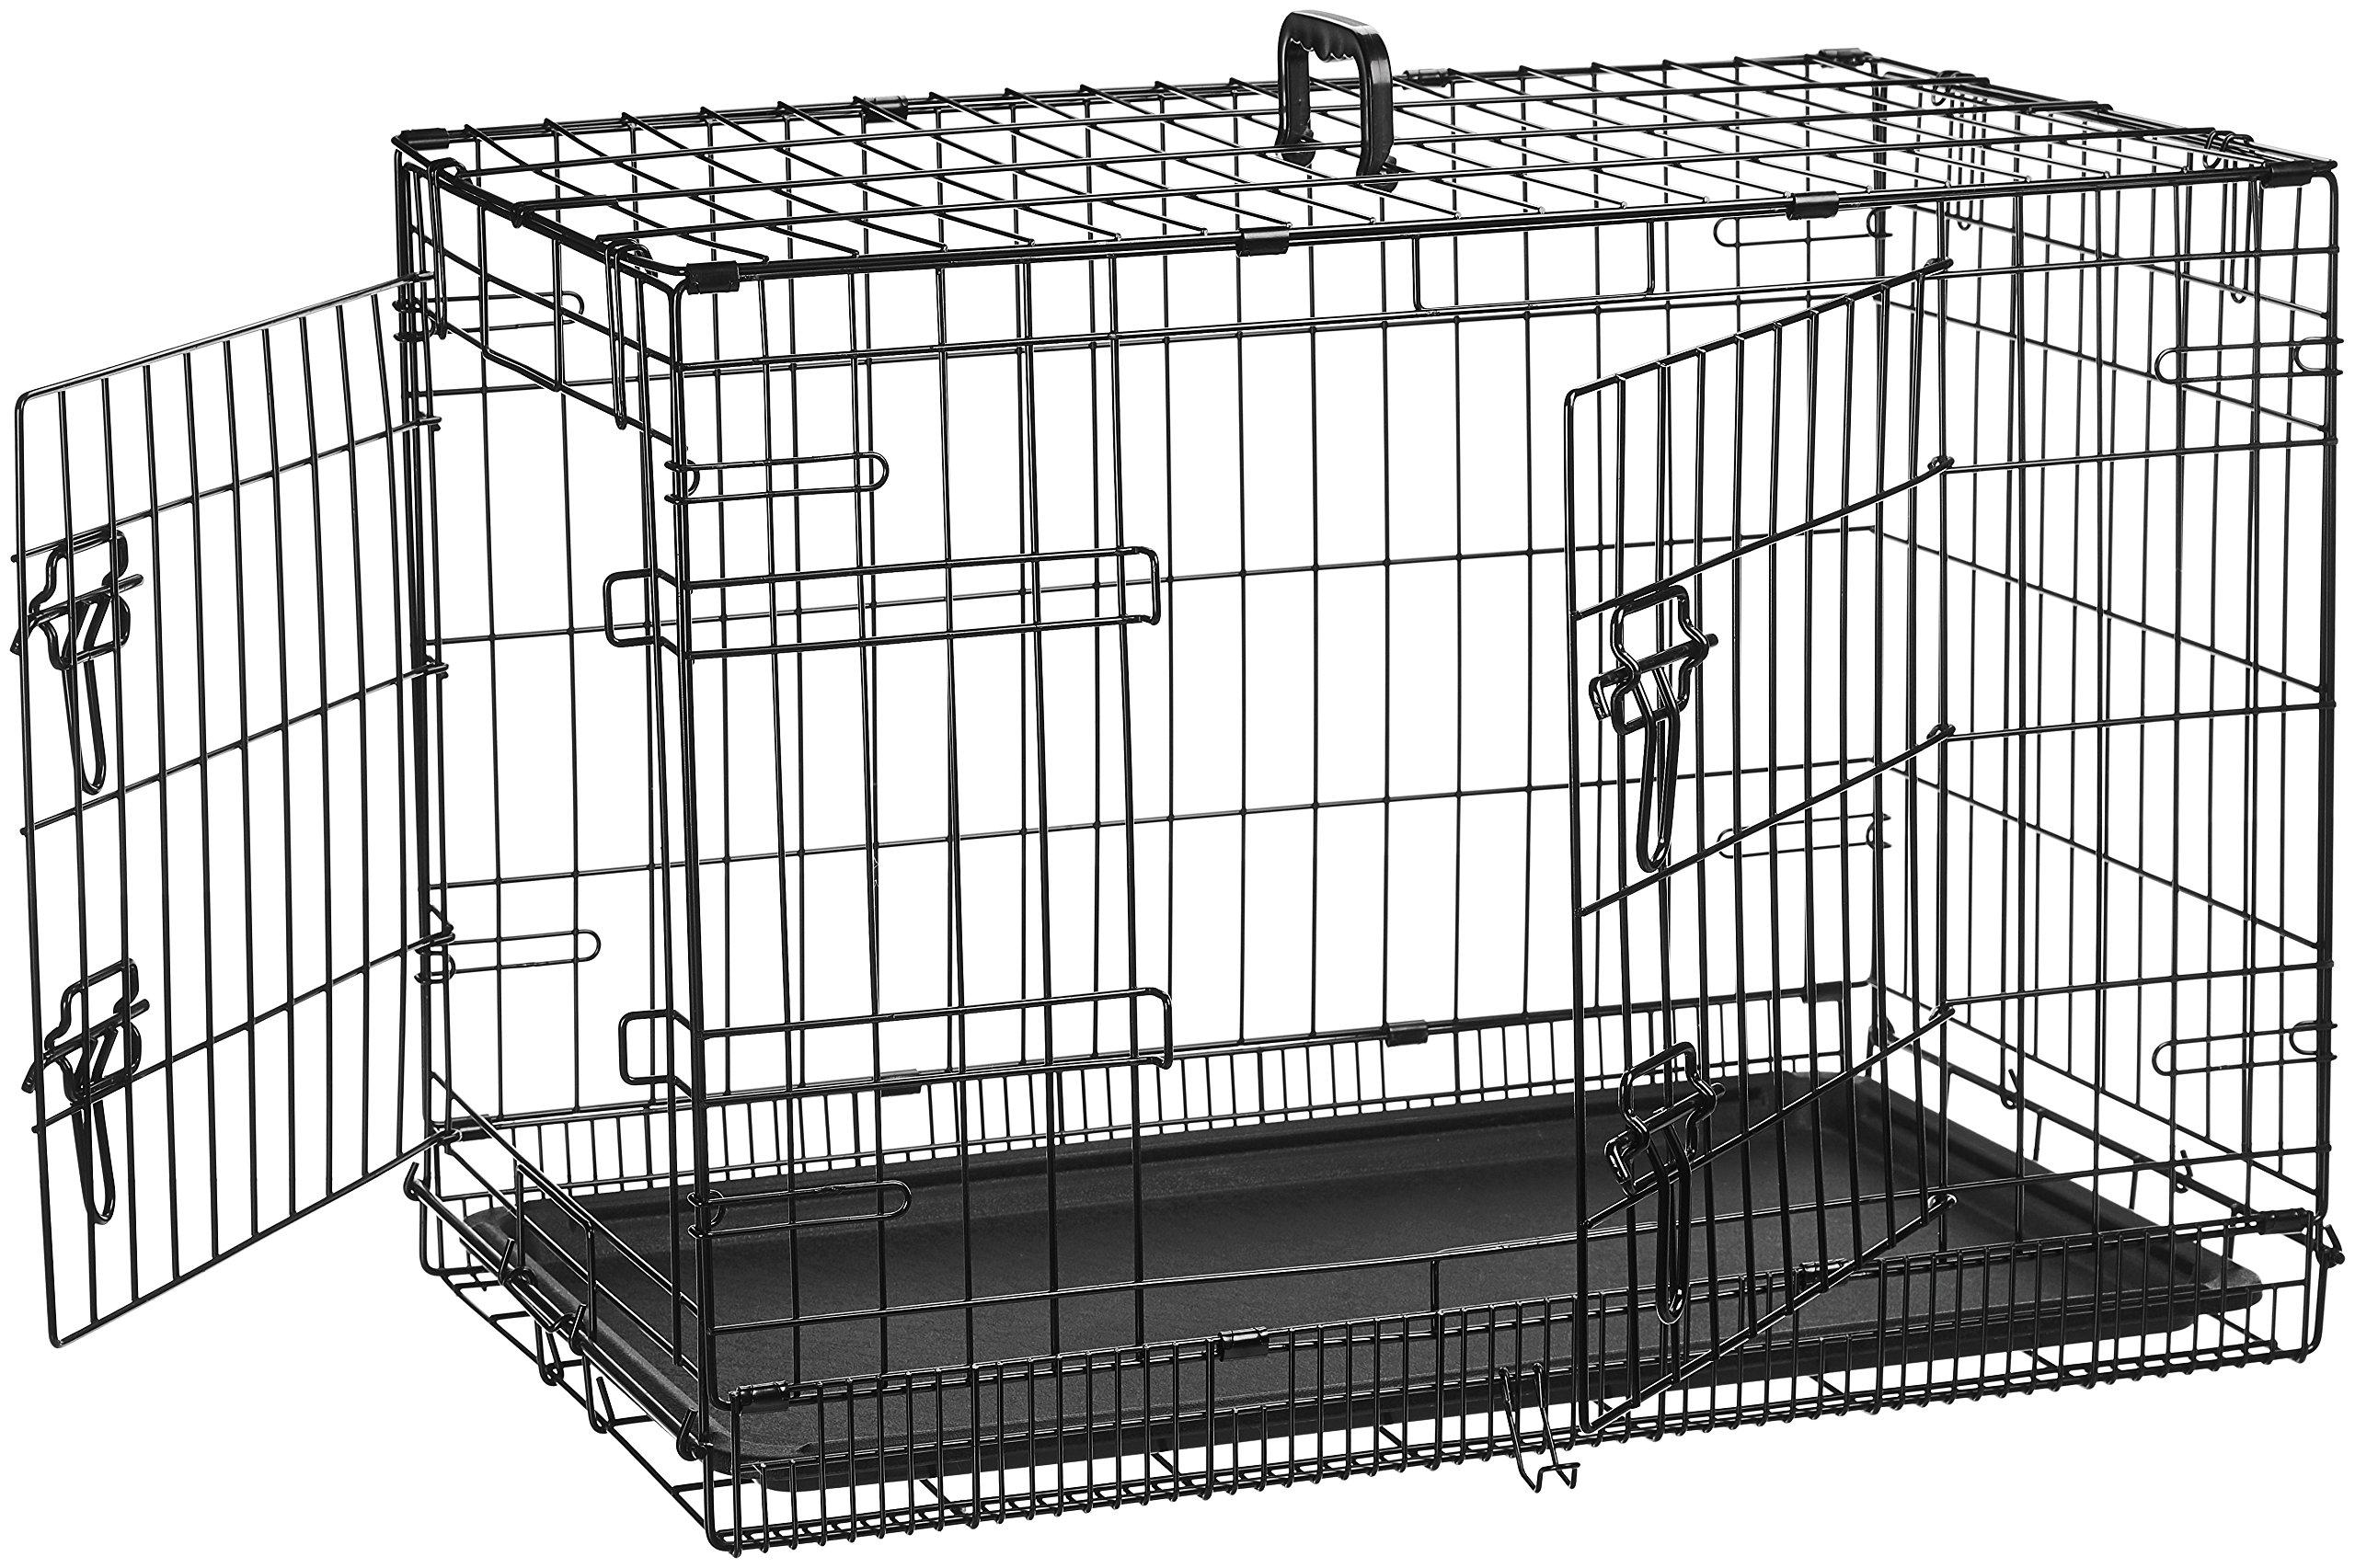 AmazonBasics Double-Door Folding Metal Dog Crate - 30 Inches product image